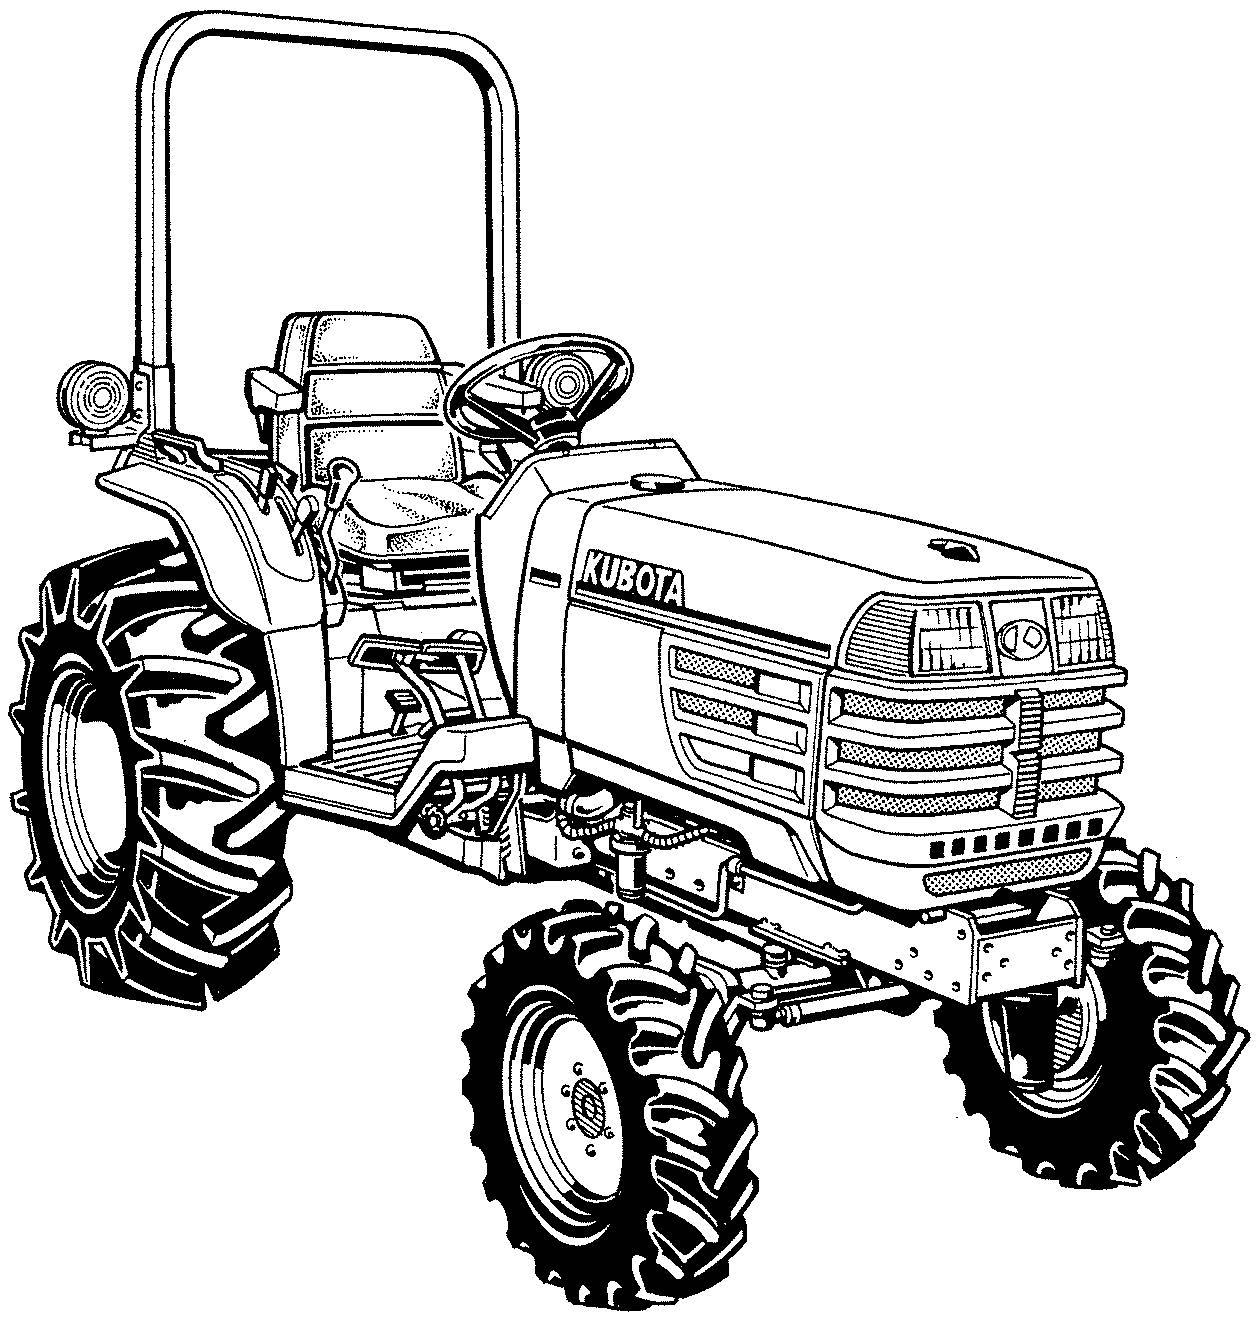 b2710 manual Lincoln Wiring Diagrams array kubota b2410 b2710 b2910 tractors workshop manual down rh sellfy